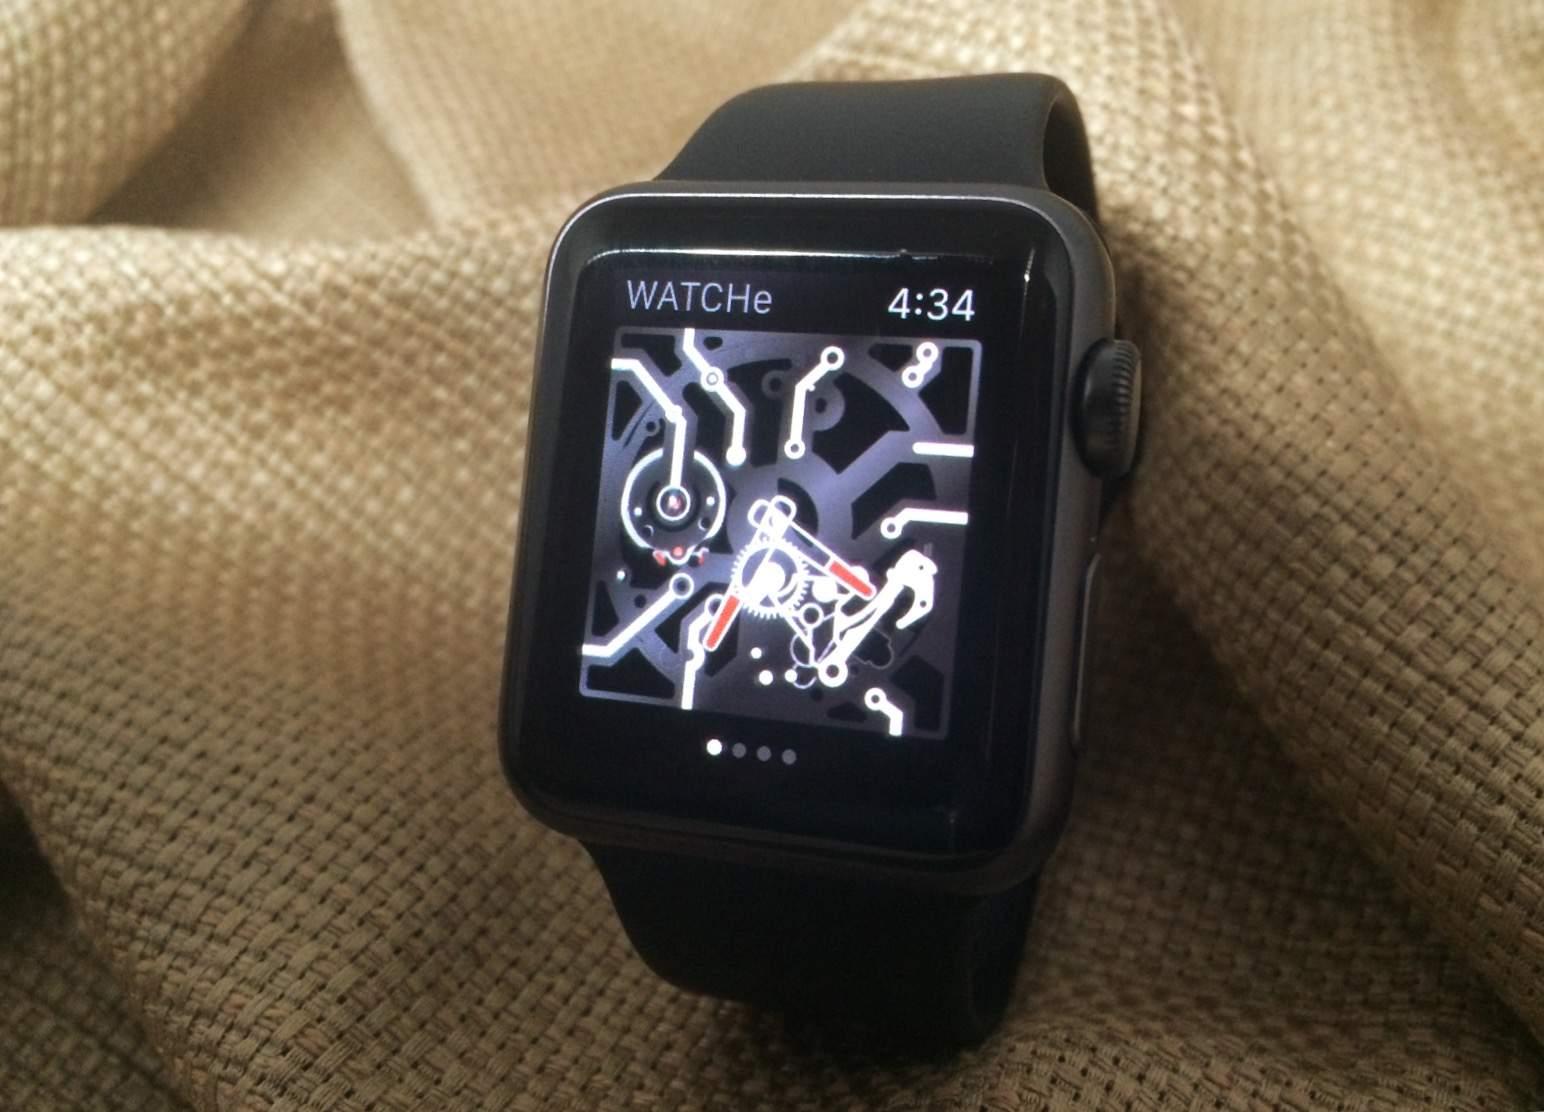 WATCHe app makes Apple Watch look oldfangled | Cult of Mac